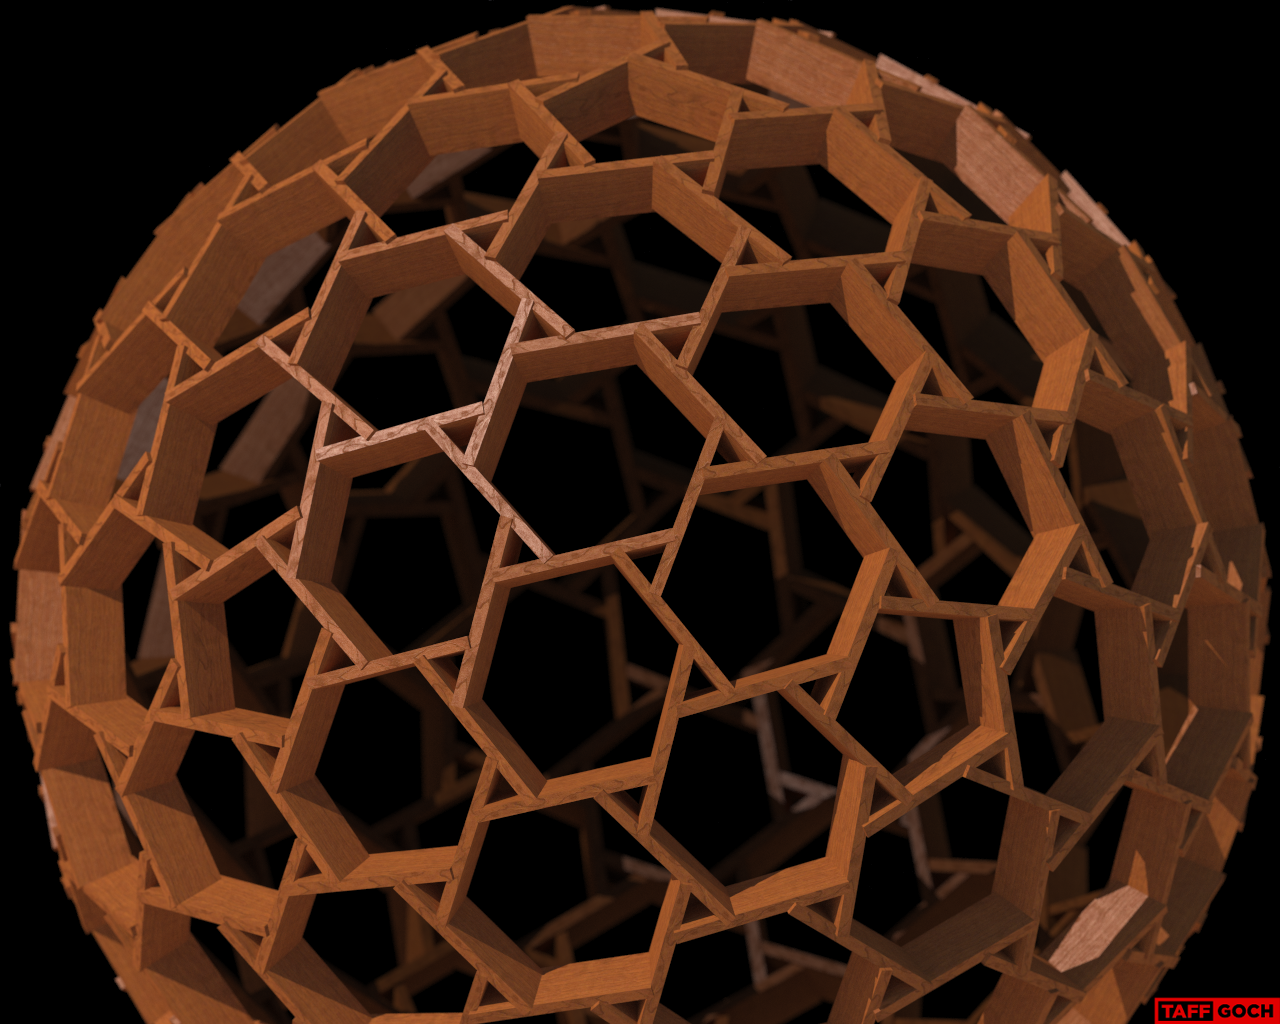 Lumber Reciprocal Frame by TaffGoch